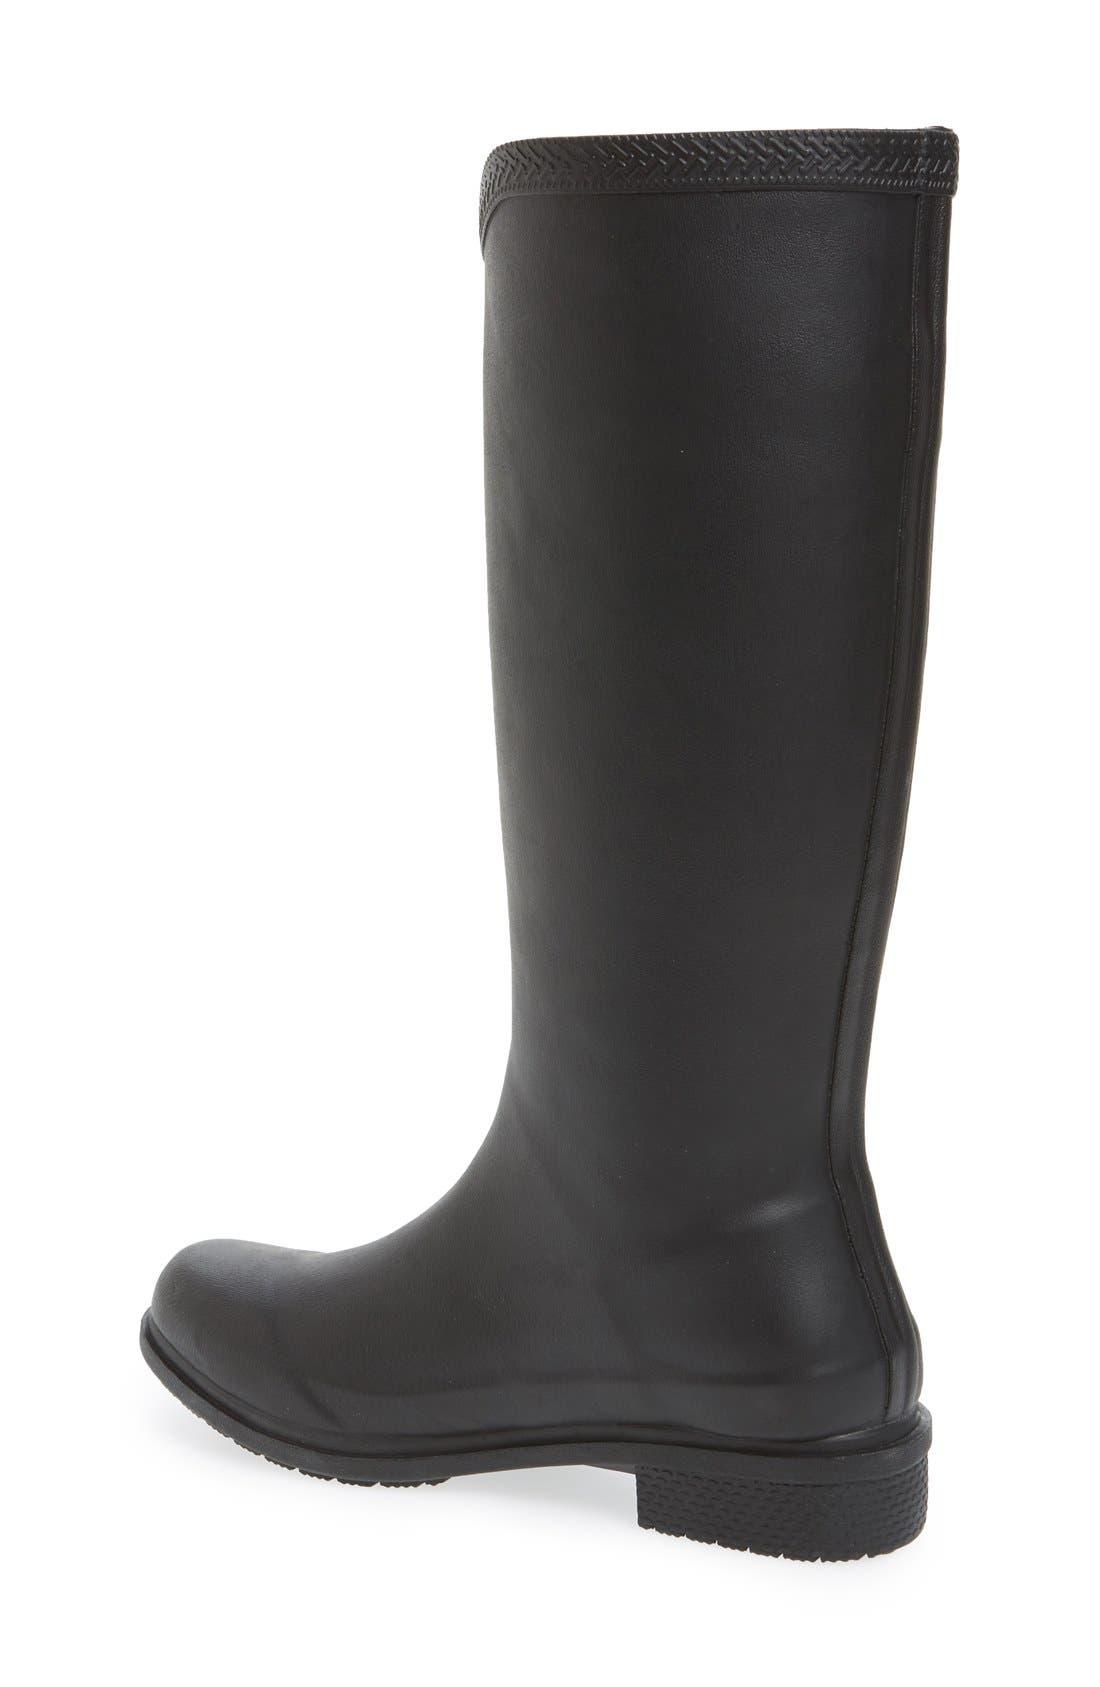 Alternate Image 2  - Havaianas 'Galochas Hi Matte' Waterproof Rain Boot (Women) (Wide Calf)